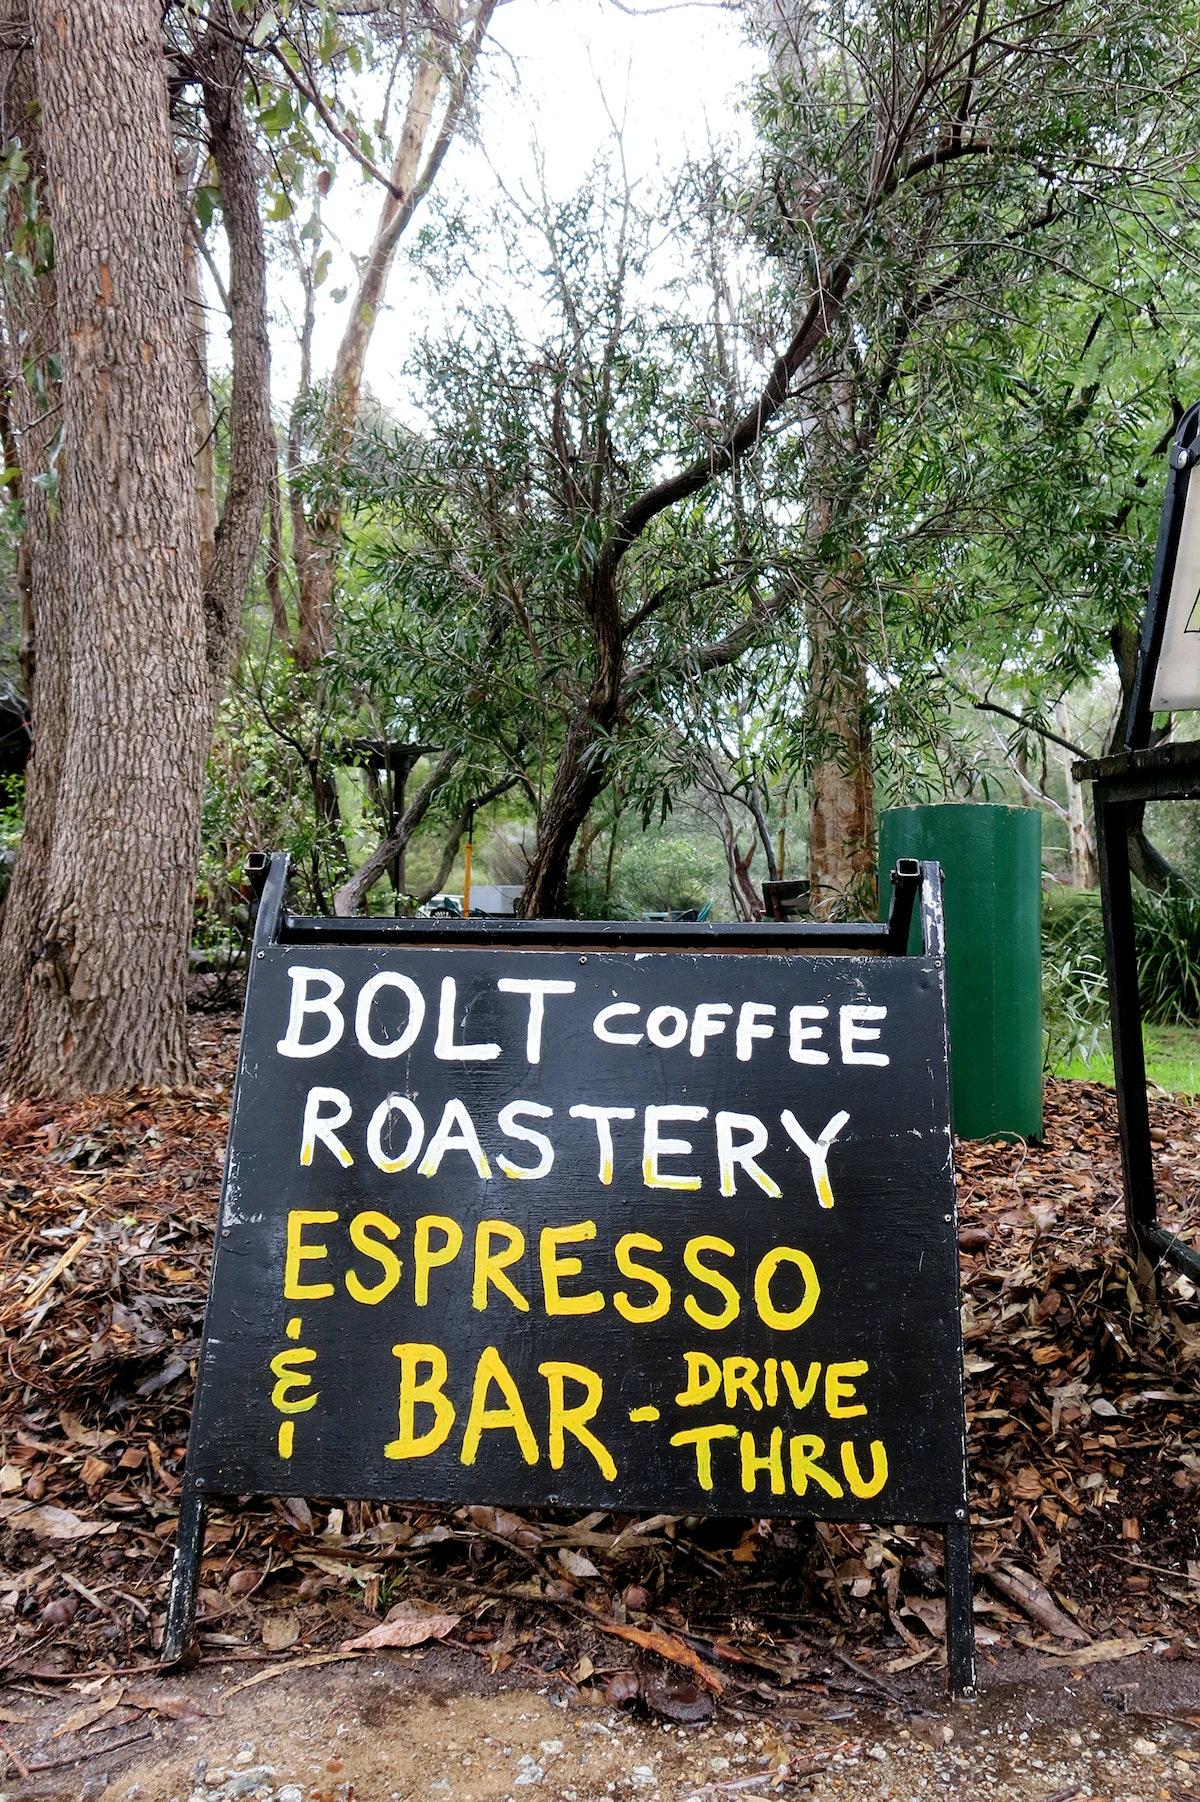 Bolt Coffee Roasters